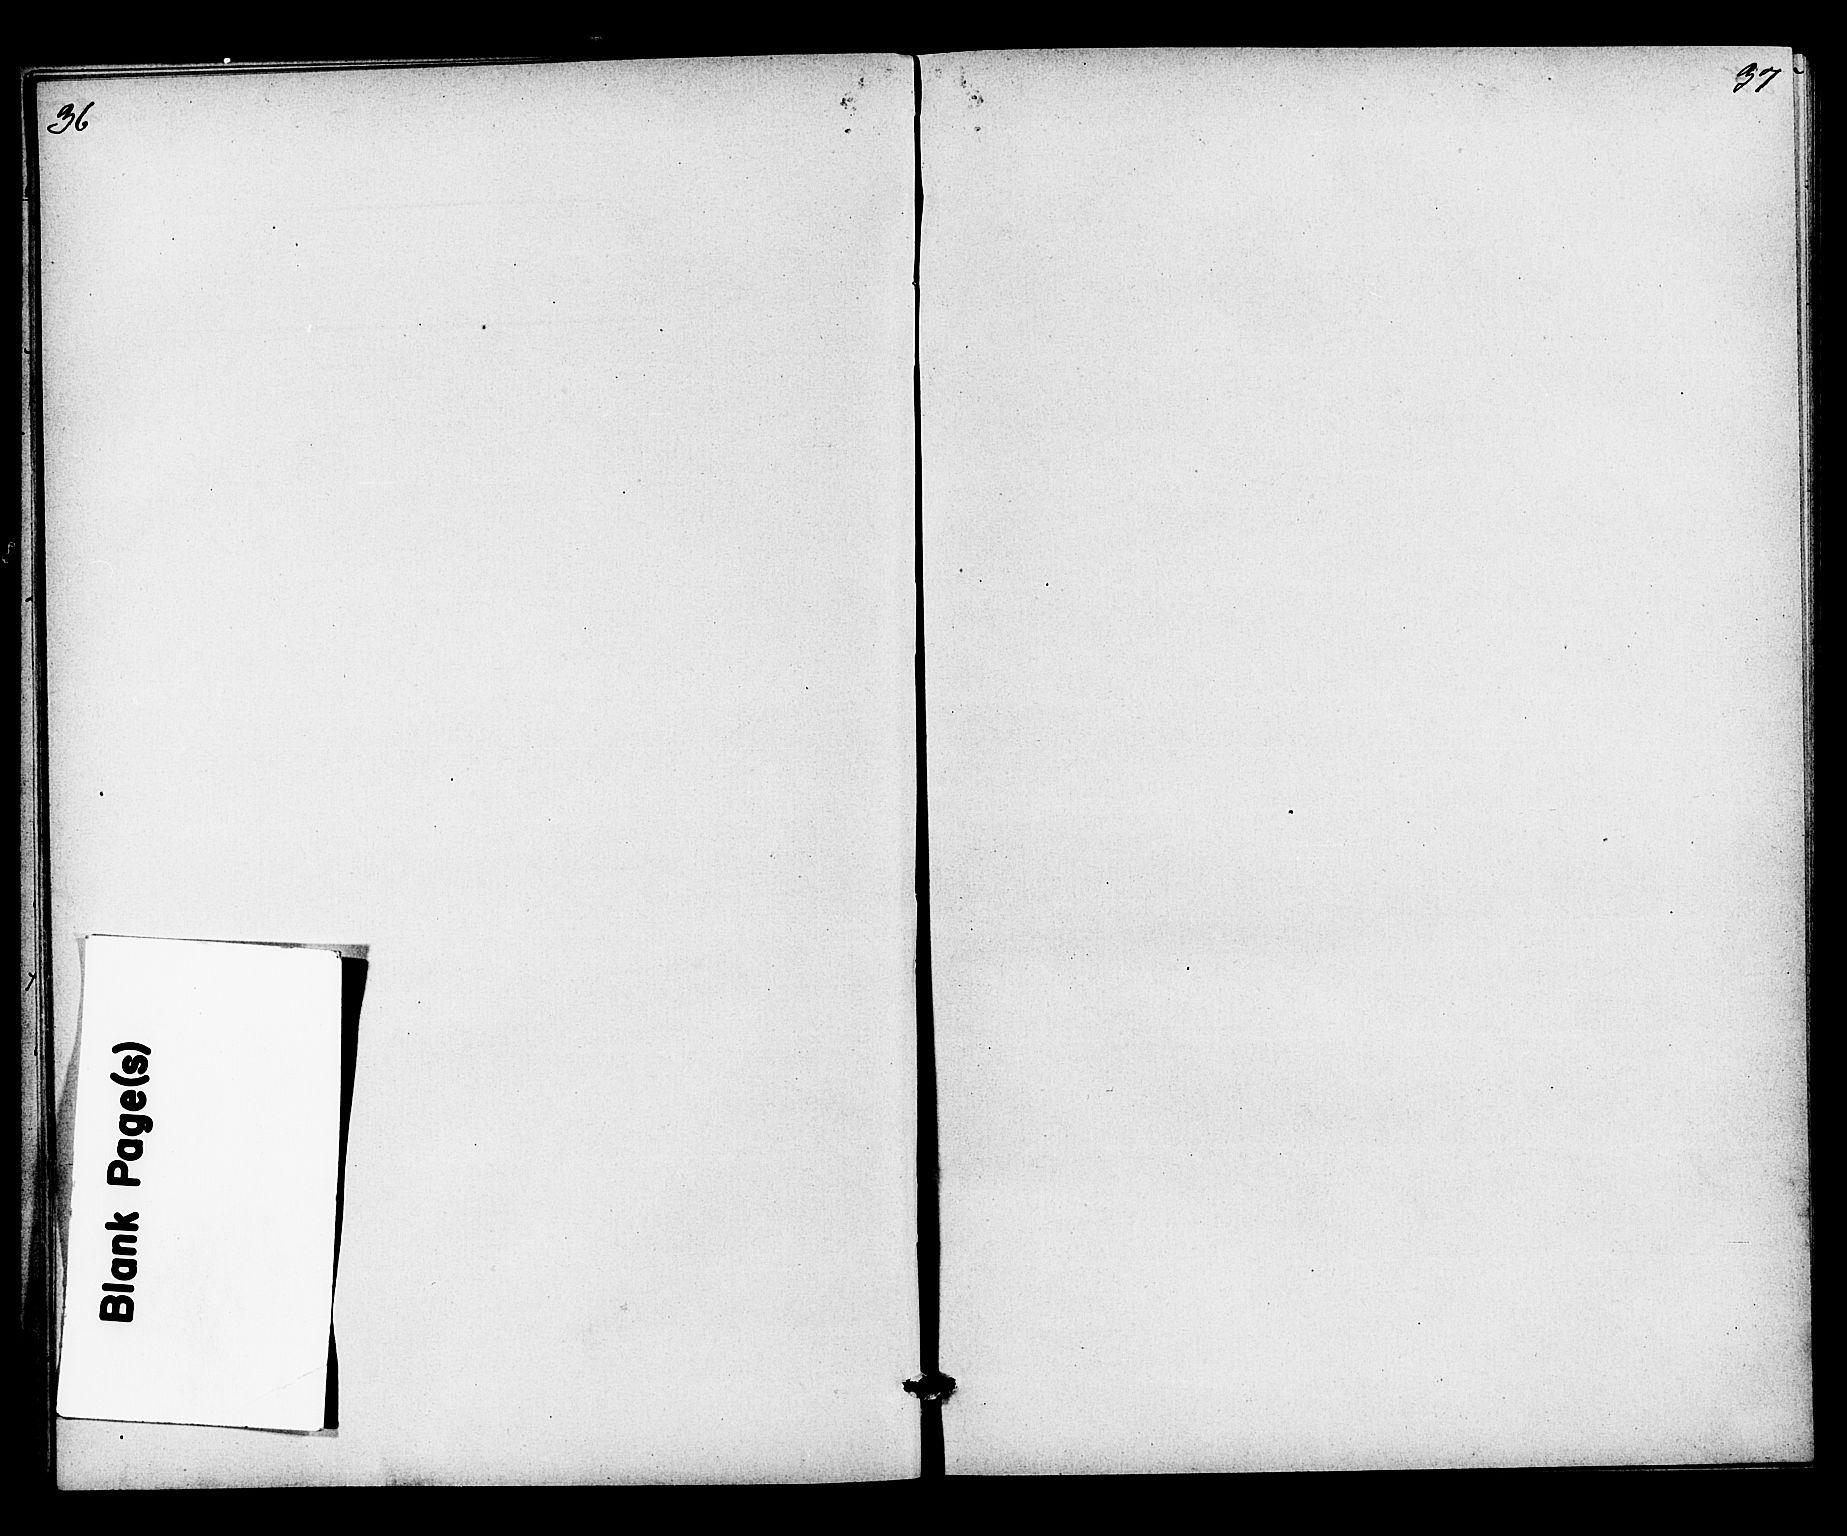 SAKO, Heddal kirkebøker, G/Gb/L0001: Klokkerbok nr. II 1, 1866-1887, s. 36-37